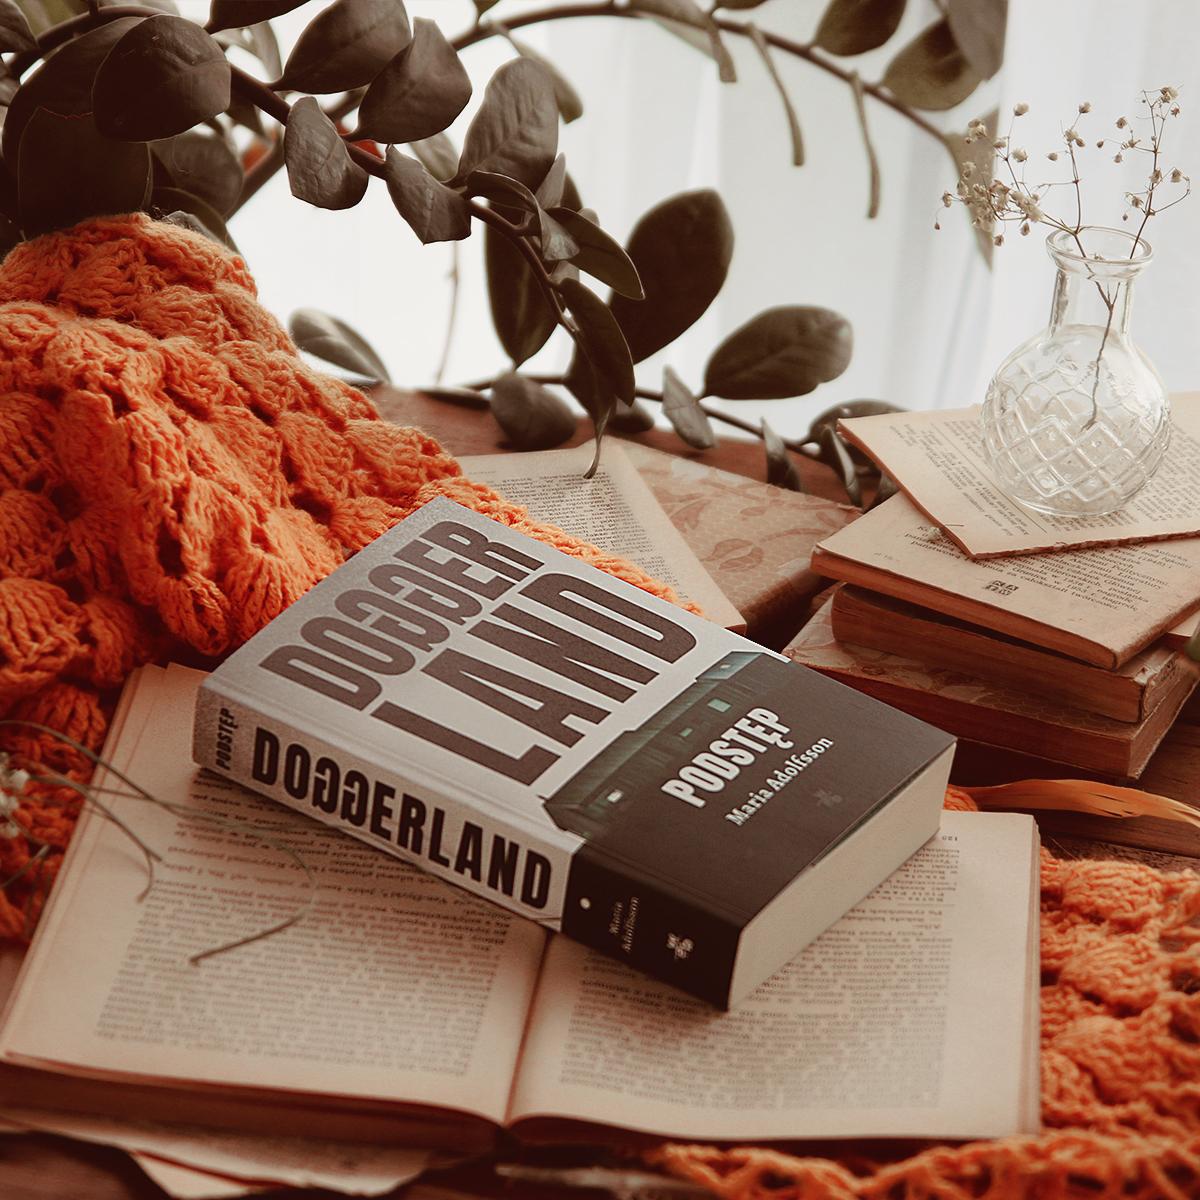 Doggerland. Podstęp - Maria Adolfsson